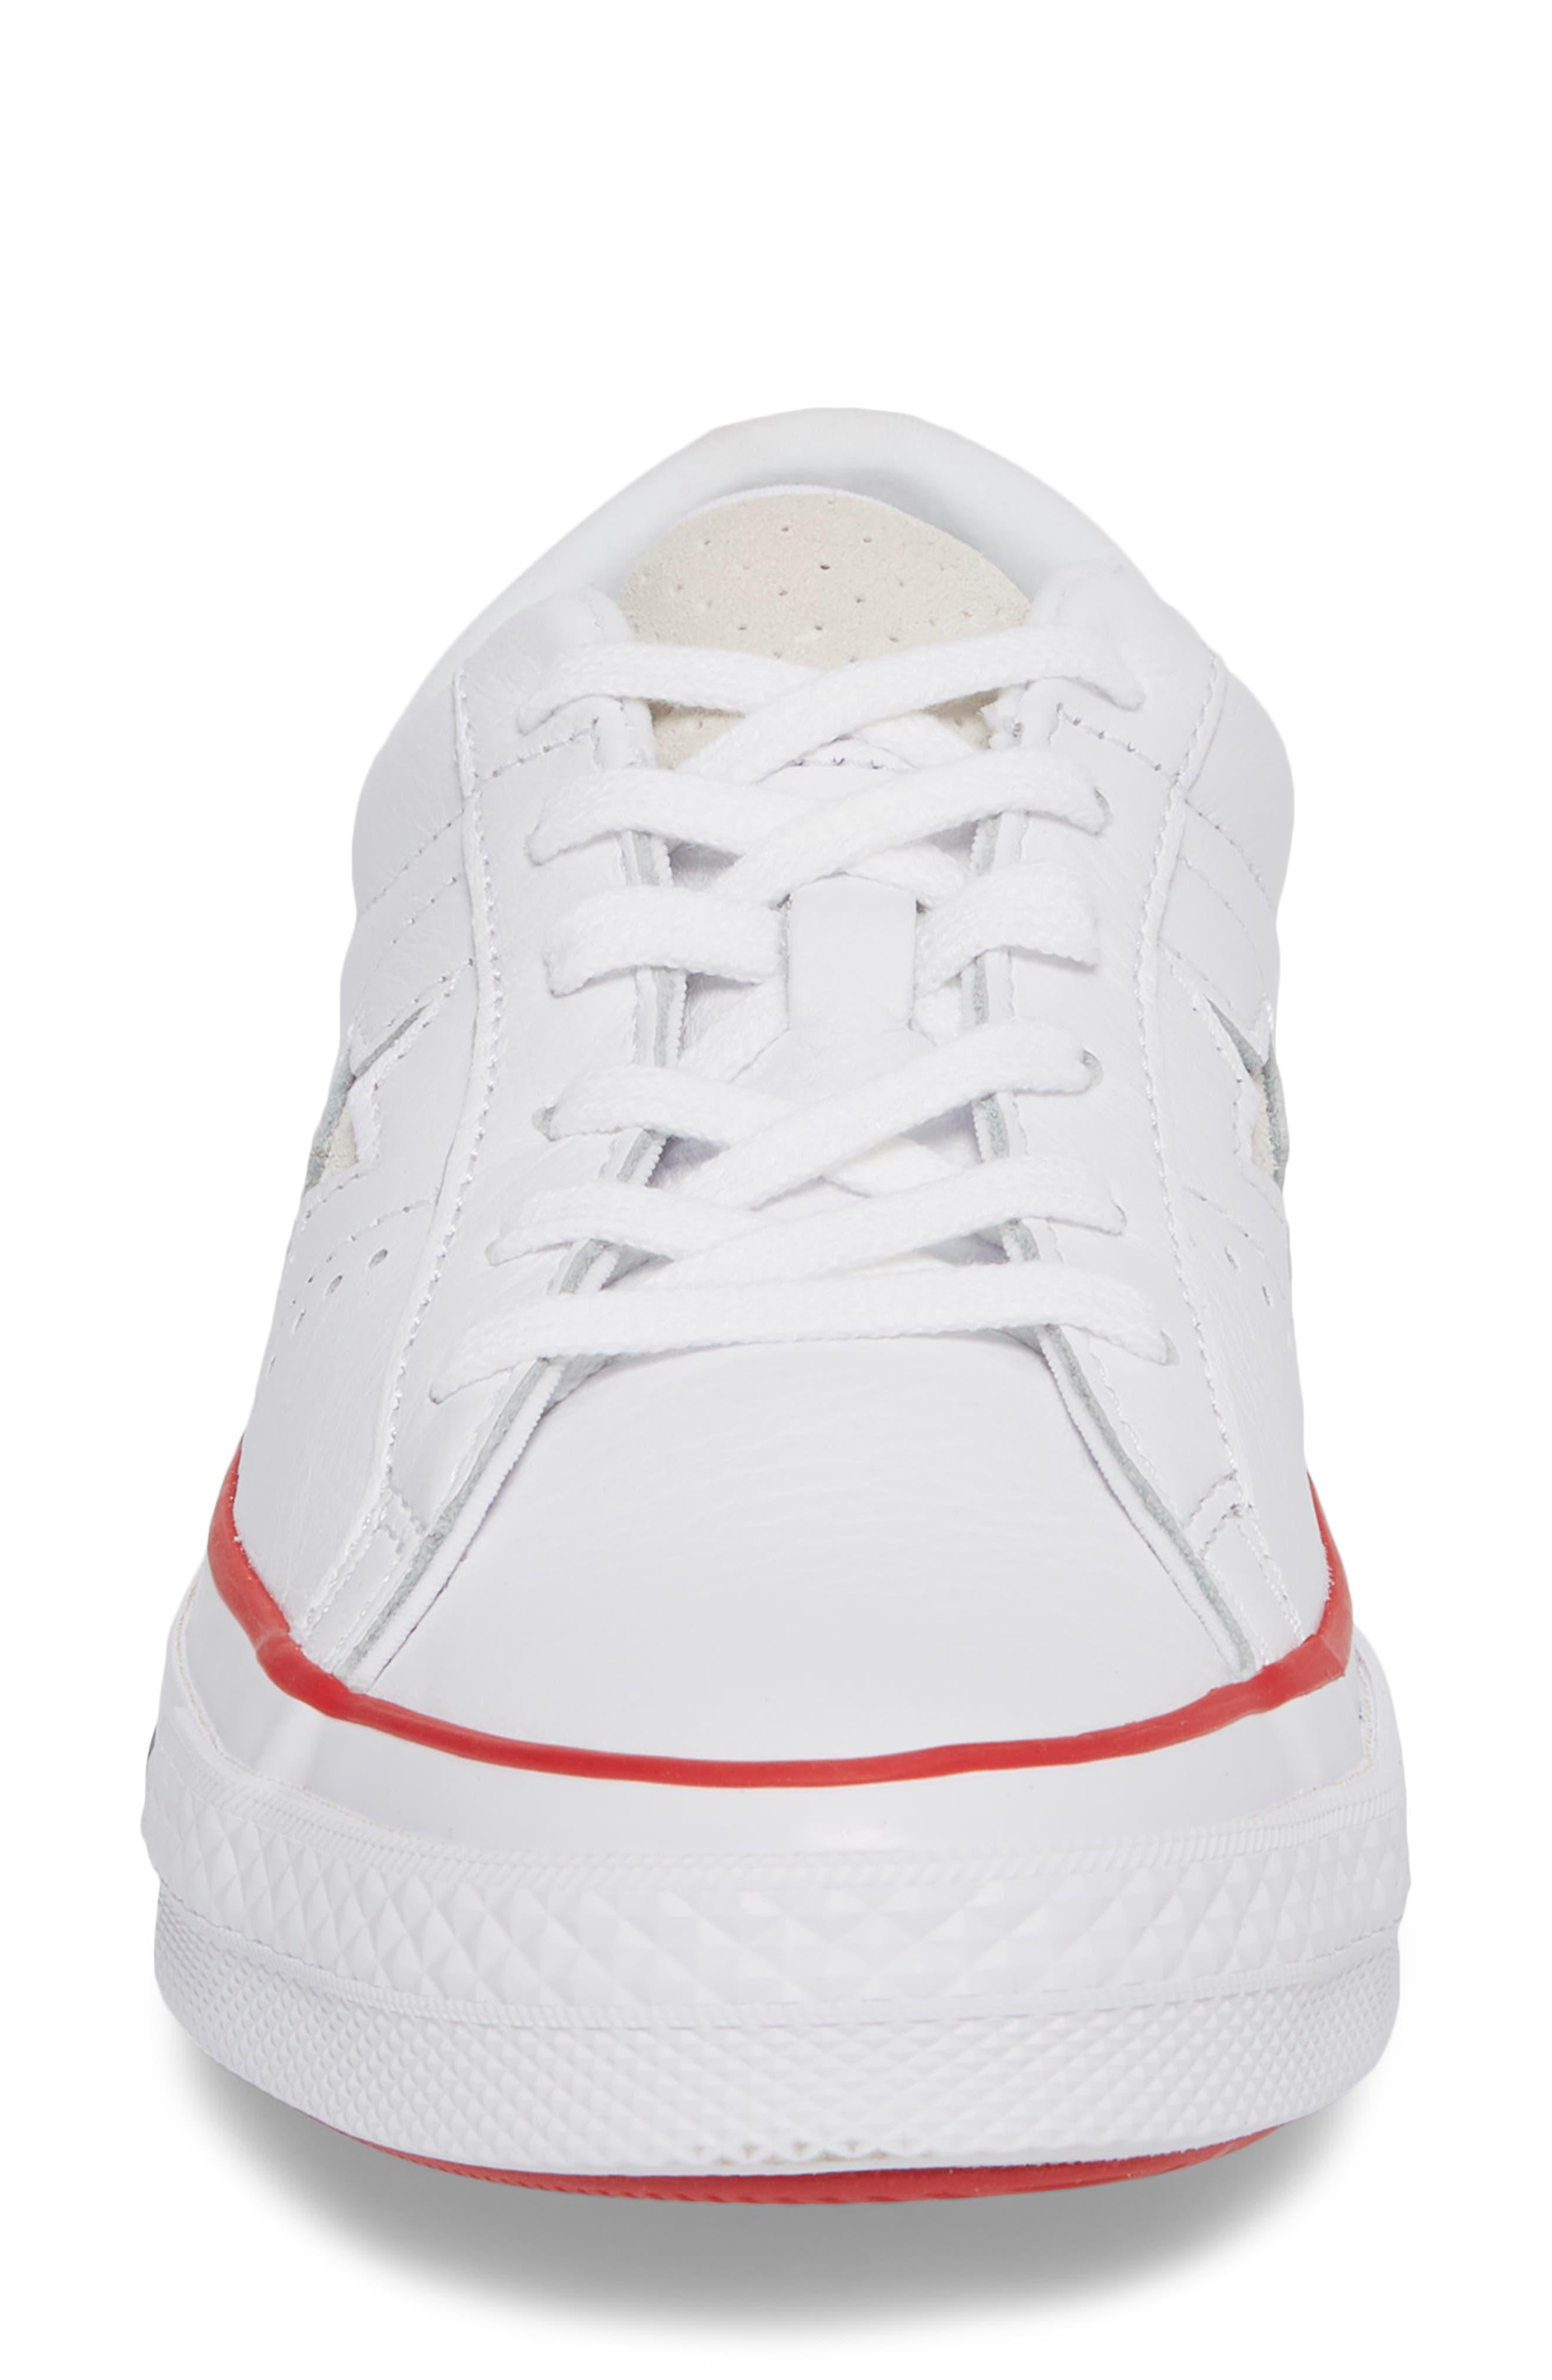 One Star Sneaker,                             Alternate thumbnail 4, color,                             White/ Gym Red